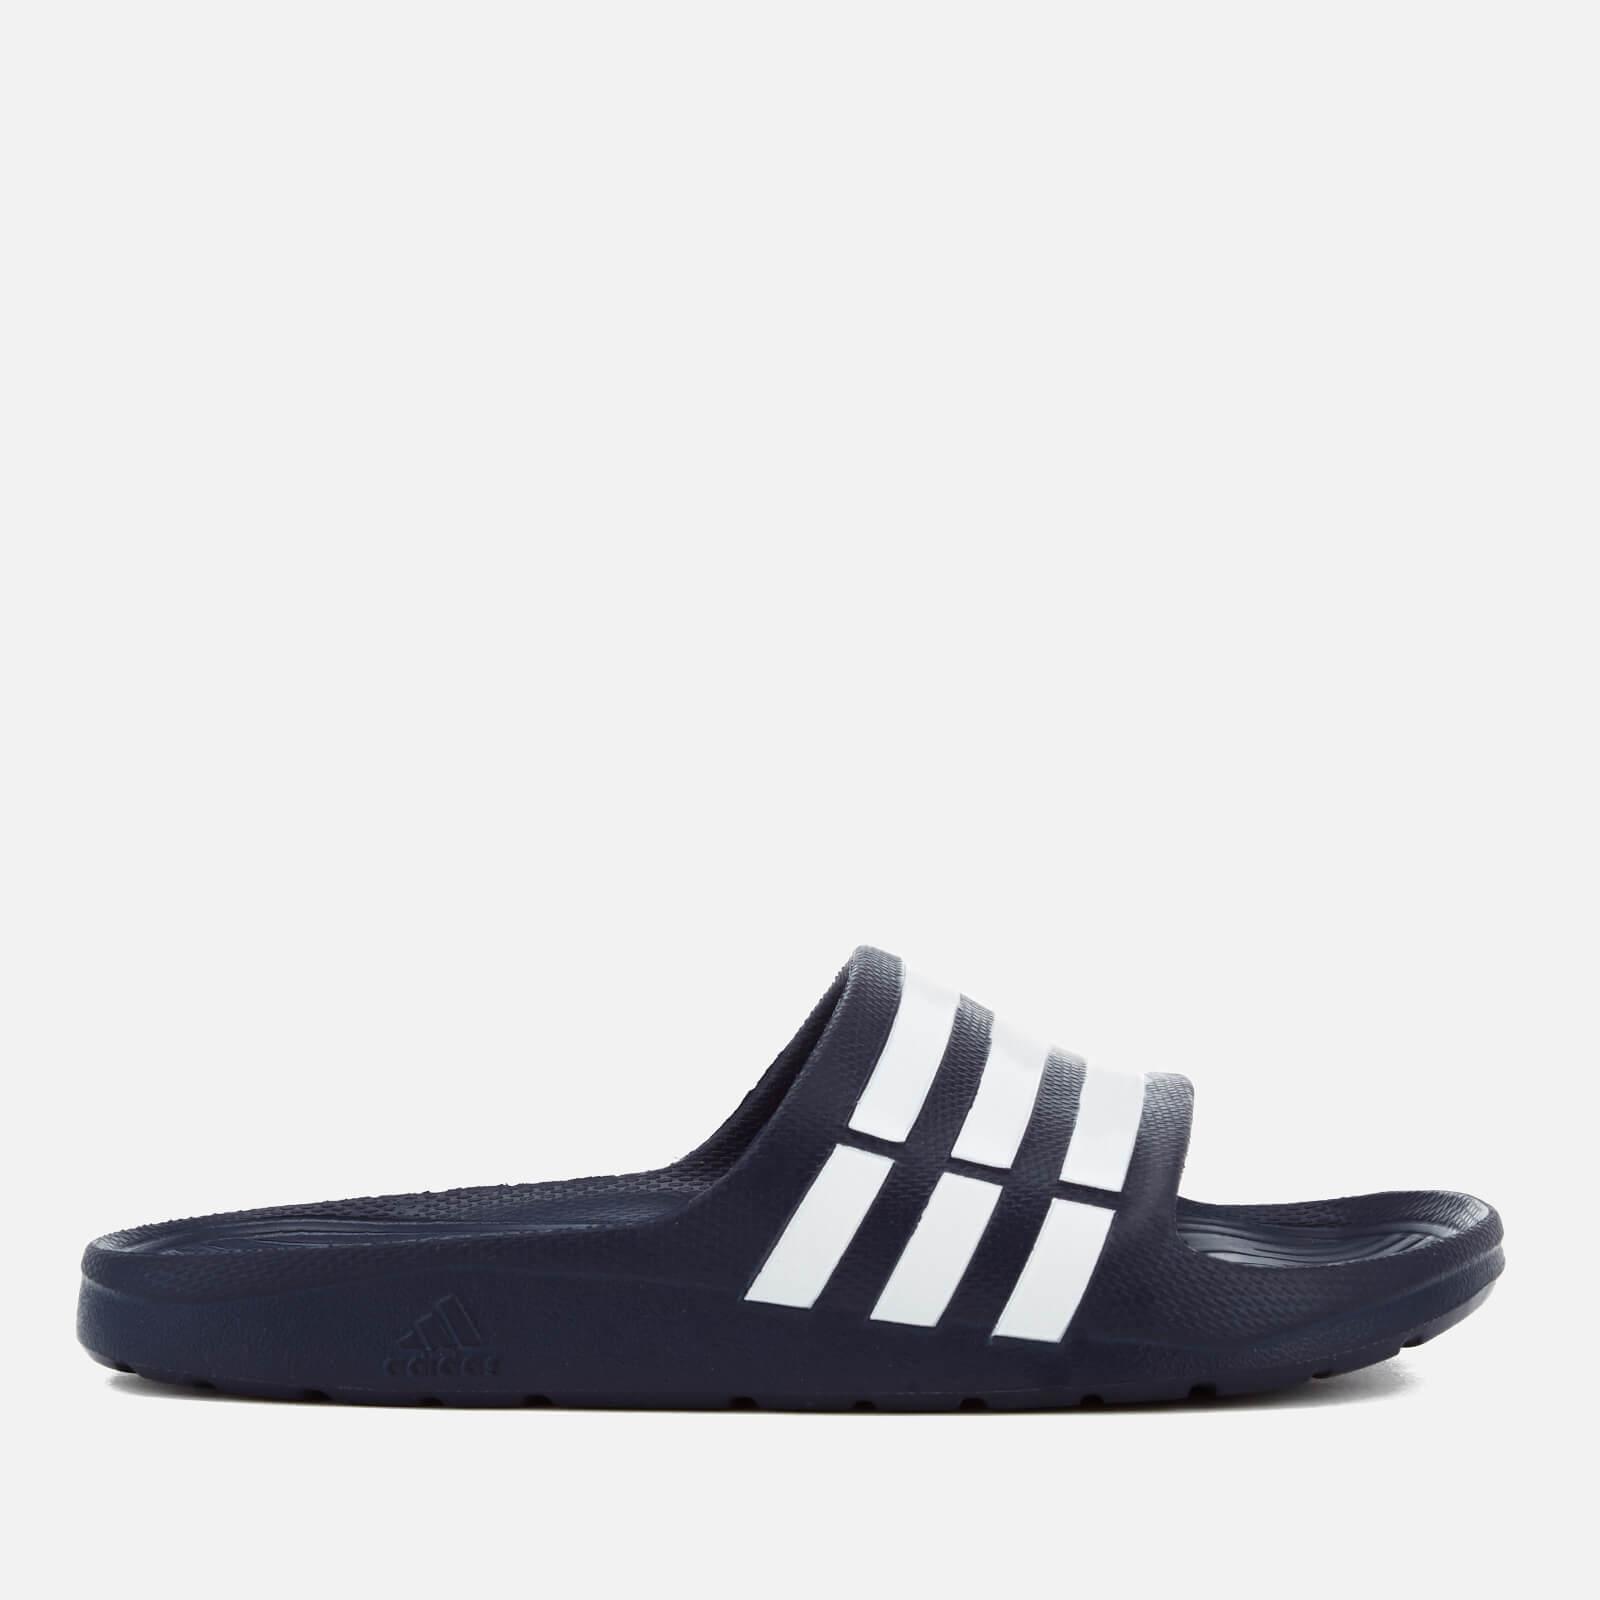 adidas Duramo Slide Sandals - Dark Blue - UK 7